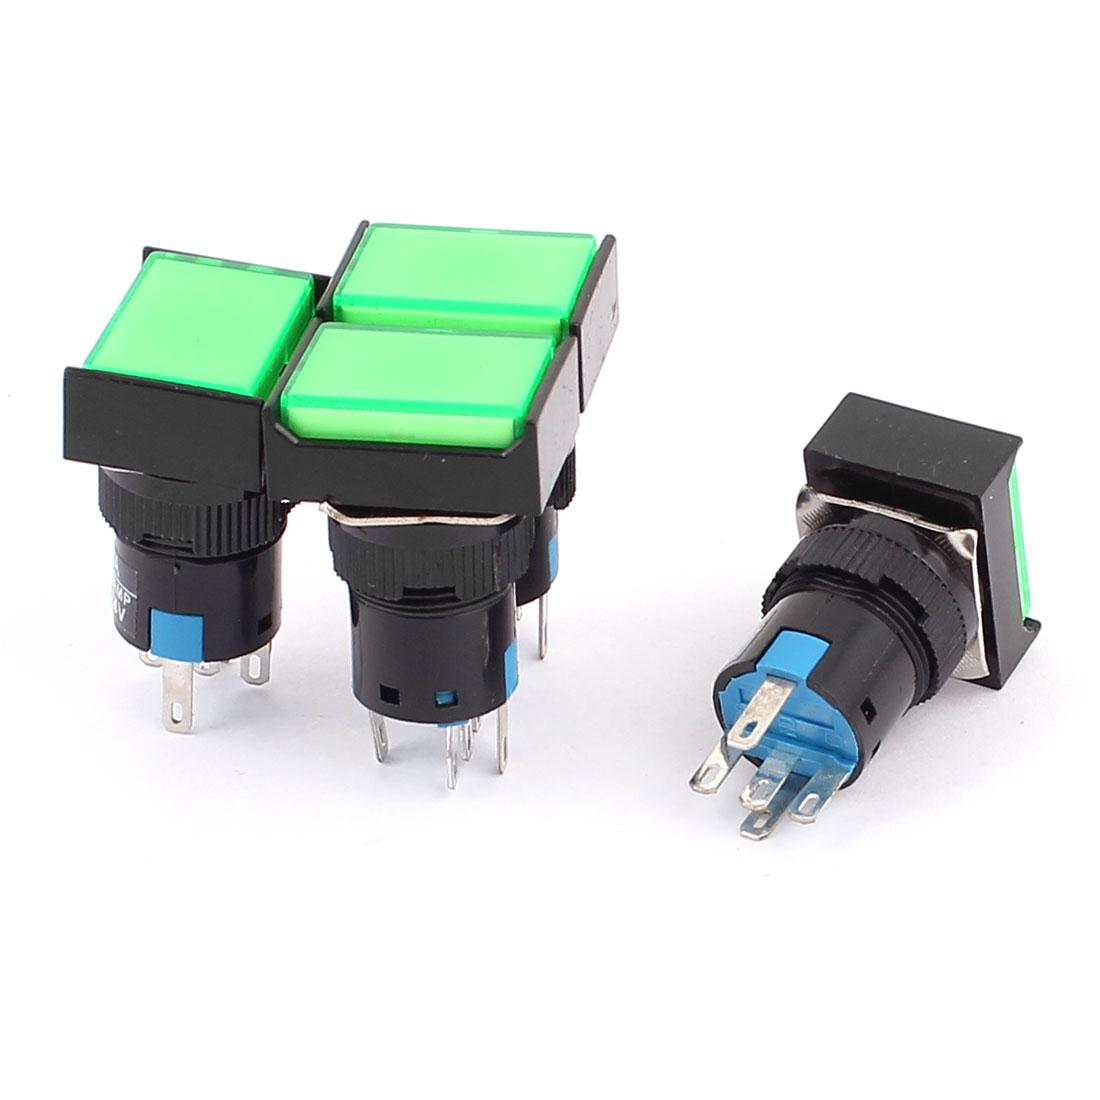 AC 250V 3A DC 30V 5A SPDT 5 Terminals Green Cap Momentary Push Button Switch 4Pcs